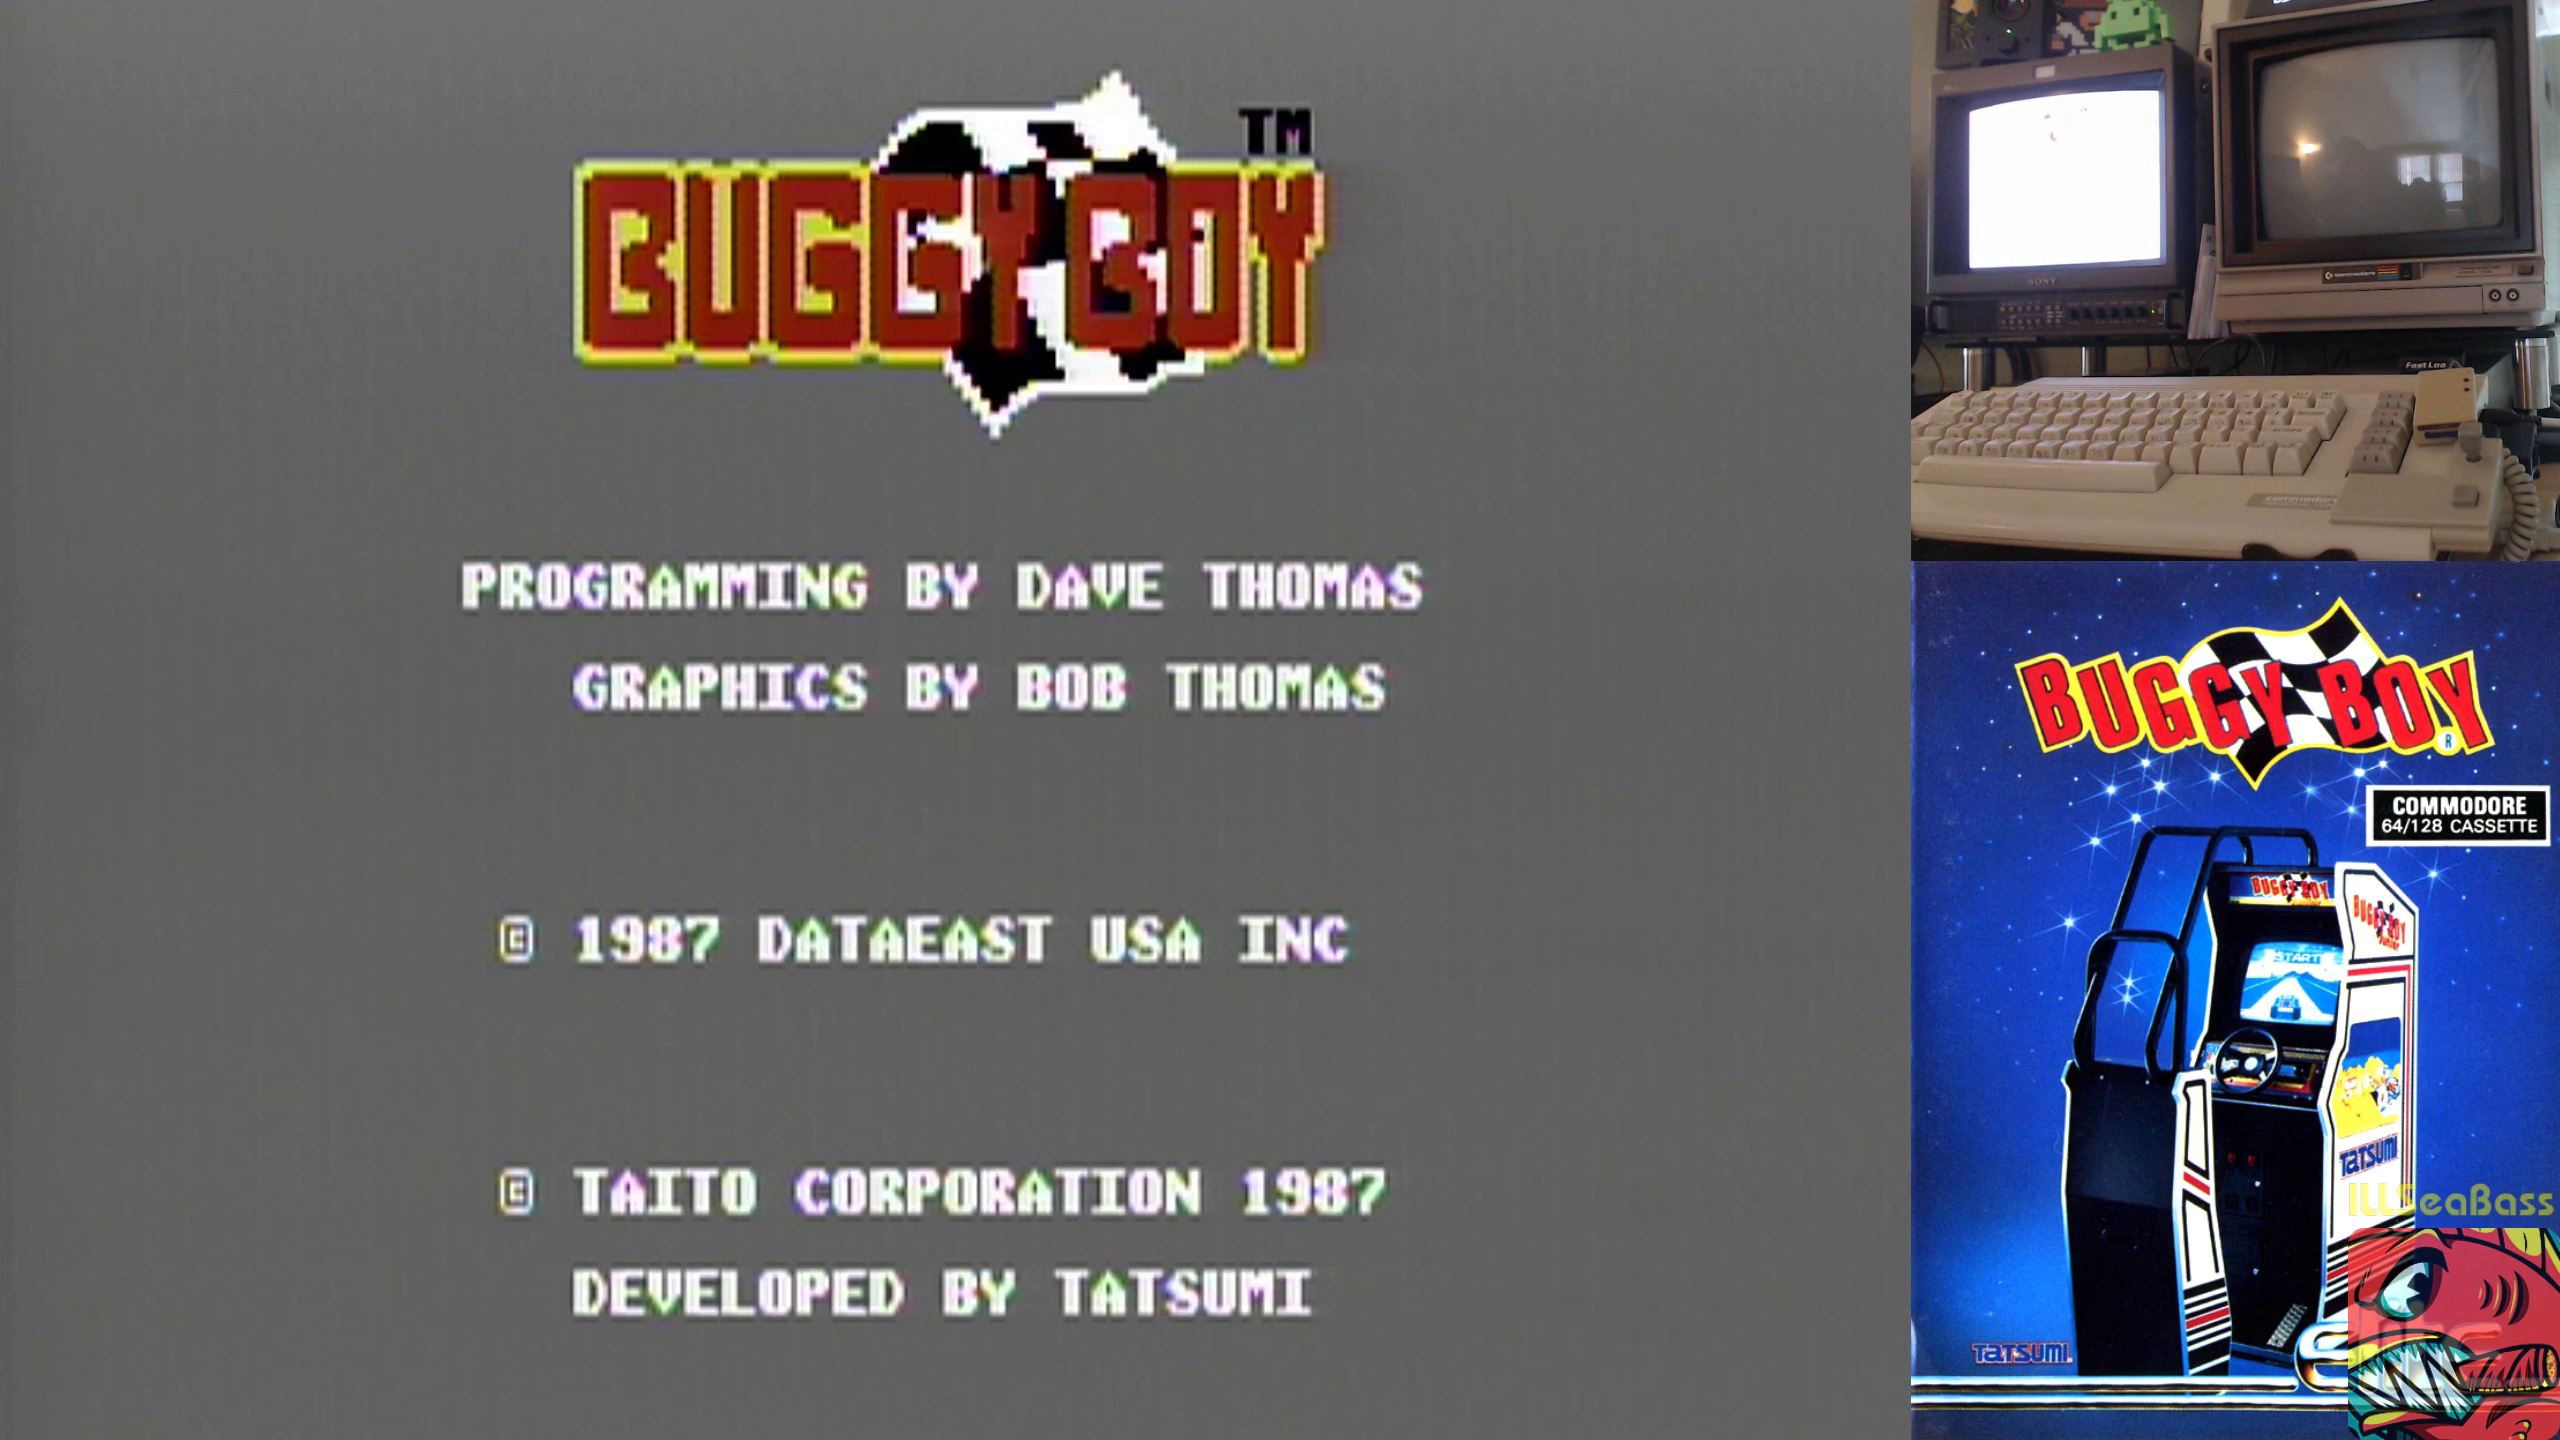 Commodore 64 - Buggy Boy - NTSC - North - 93,390 - Matt Sales